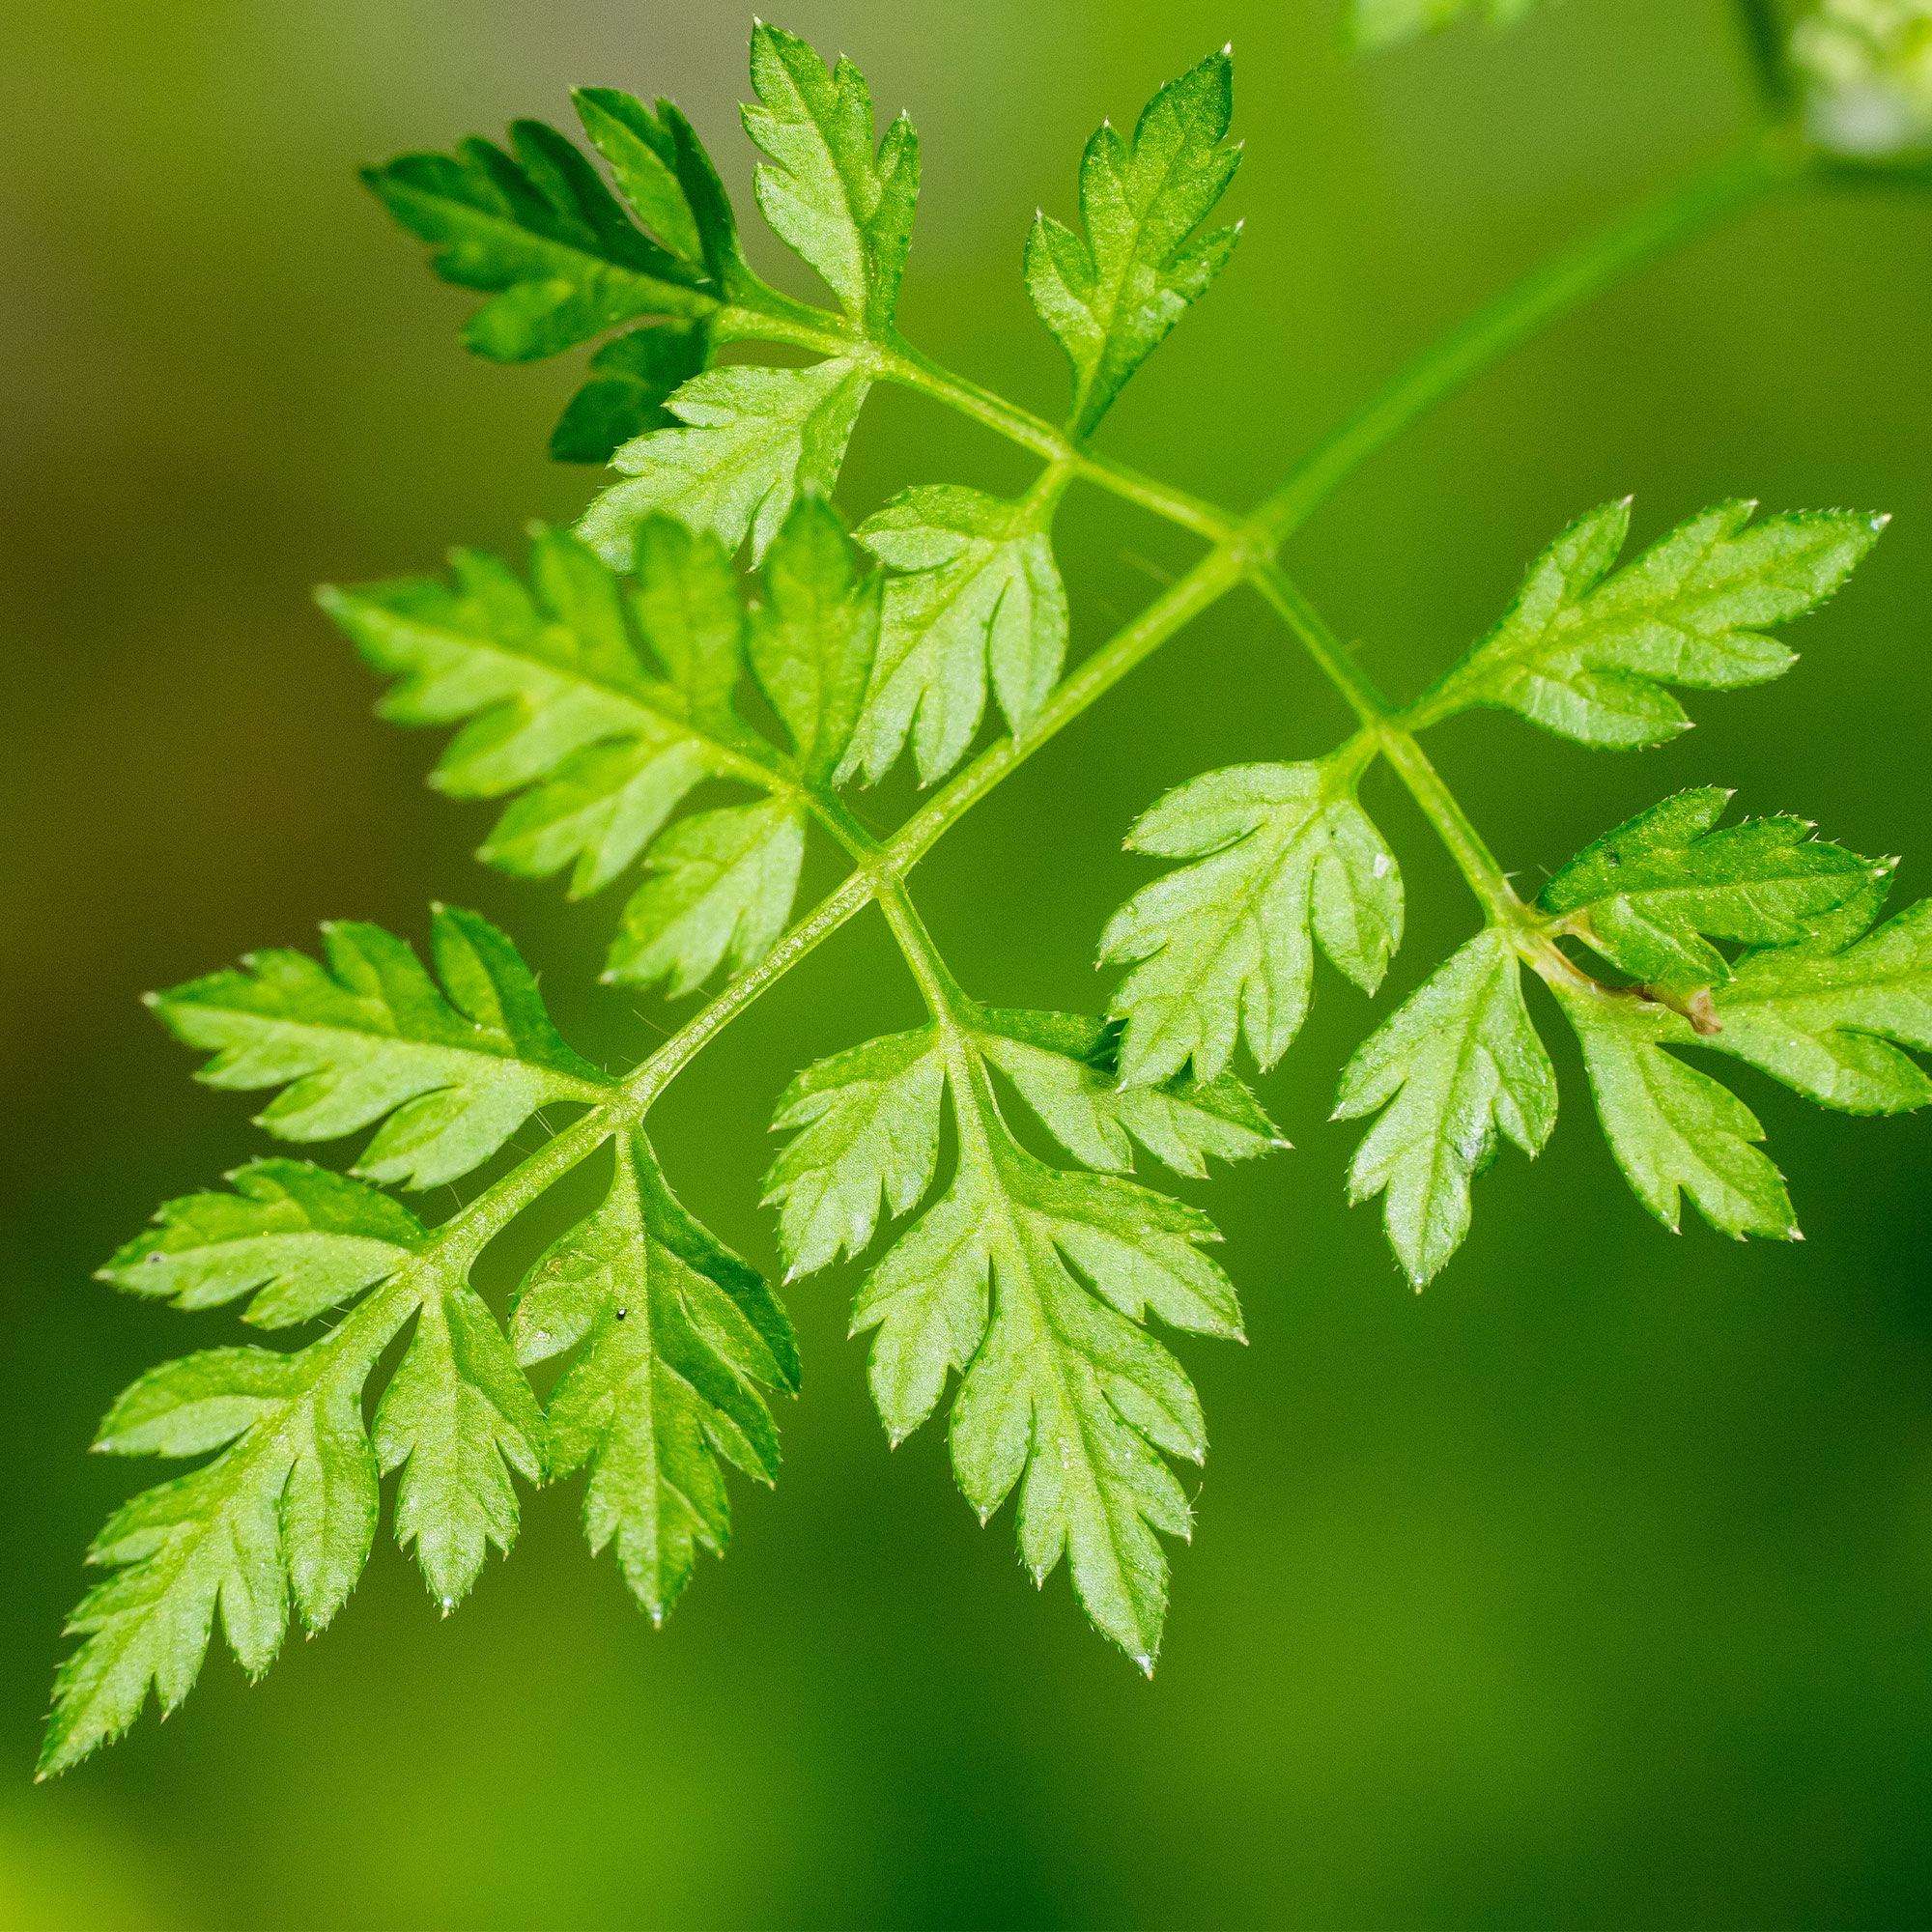 Mountain Valley Seed Company Chervil Seeds - Winter - 5 Lb Bulk ~896,000- Herb Garden & Microgreens